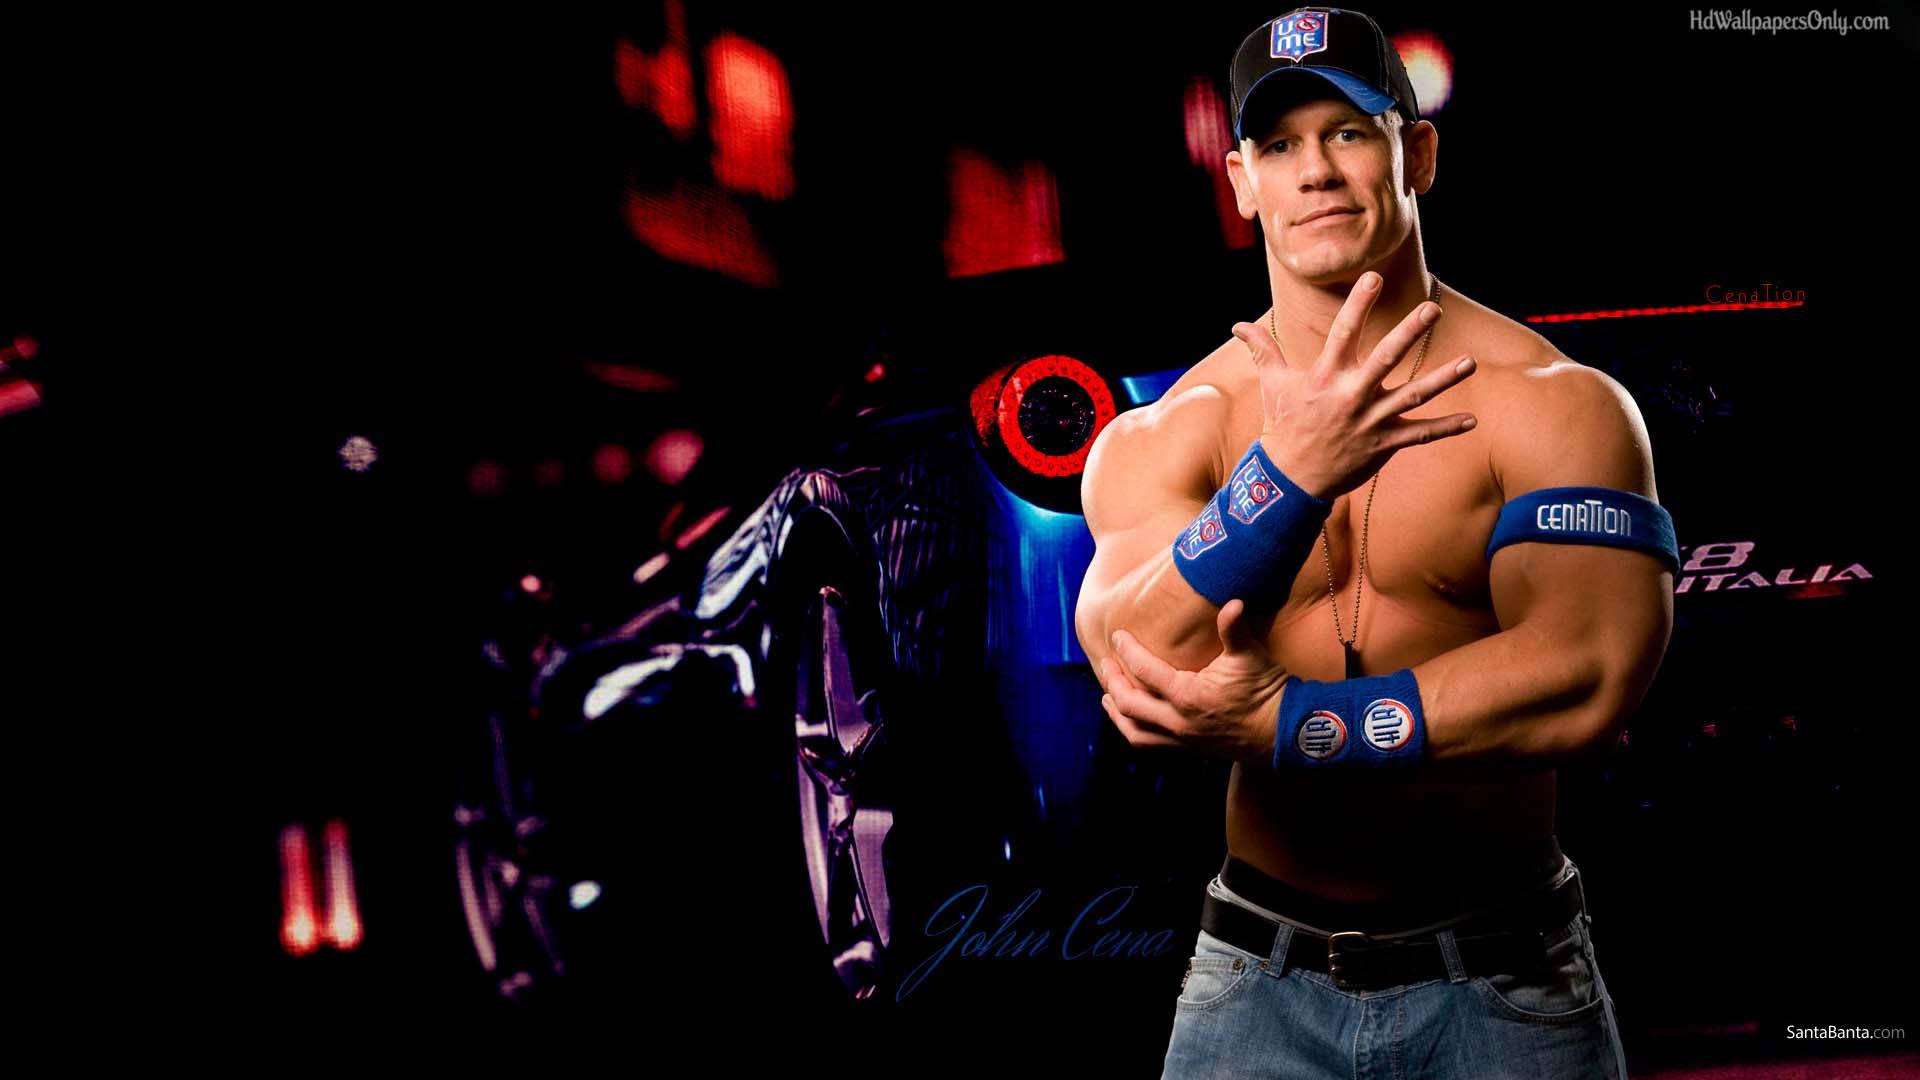 John Cena Wallpapers HD - Wallpaper Cave